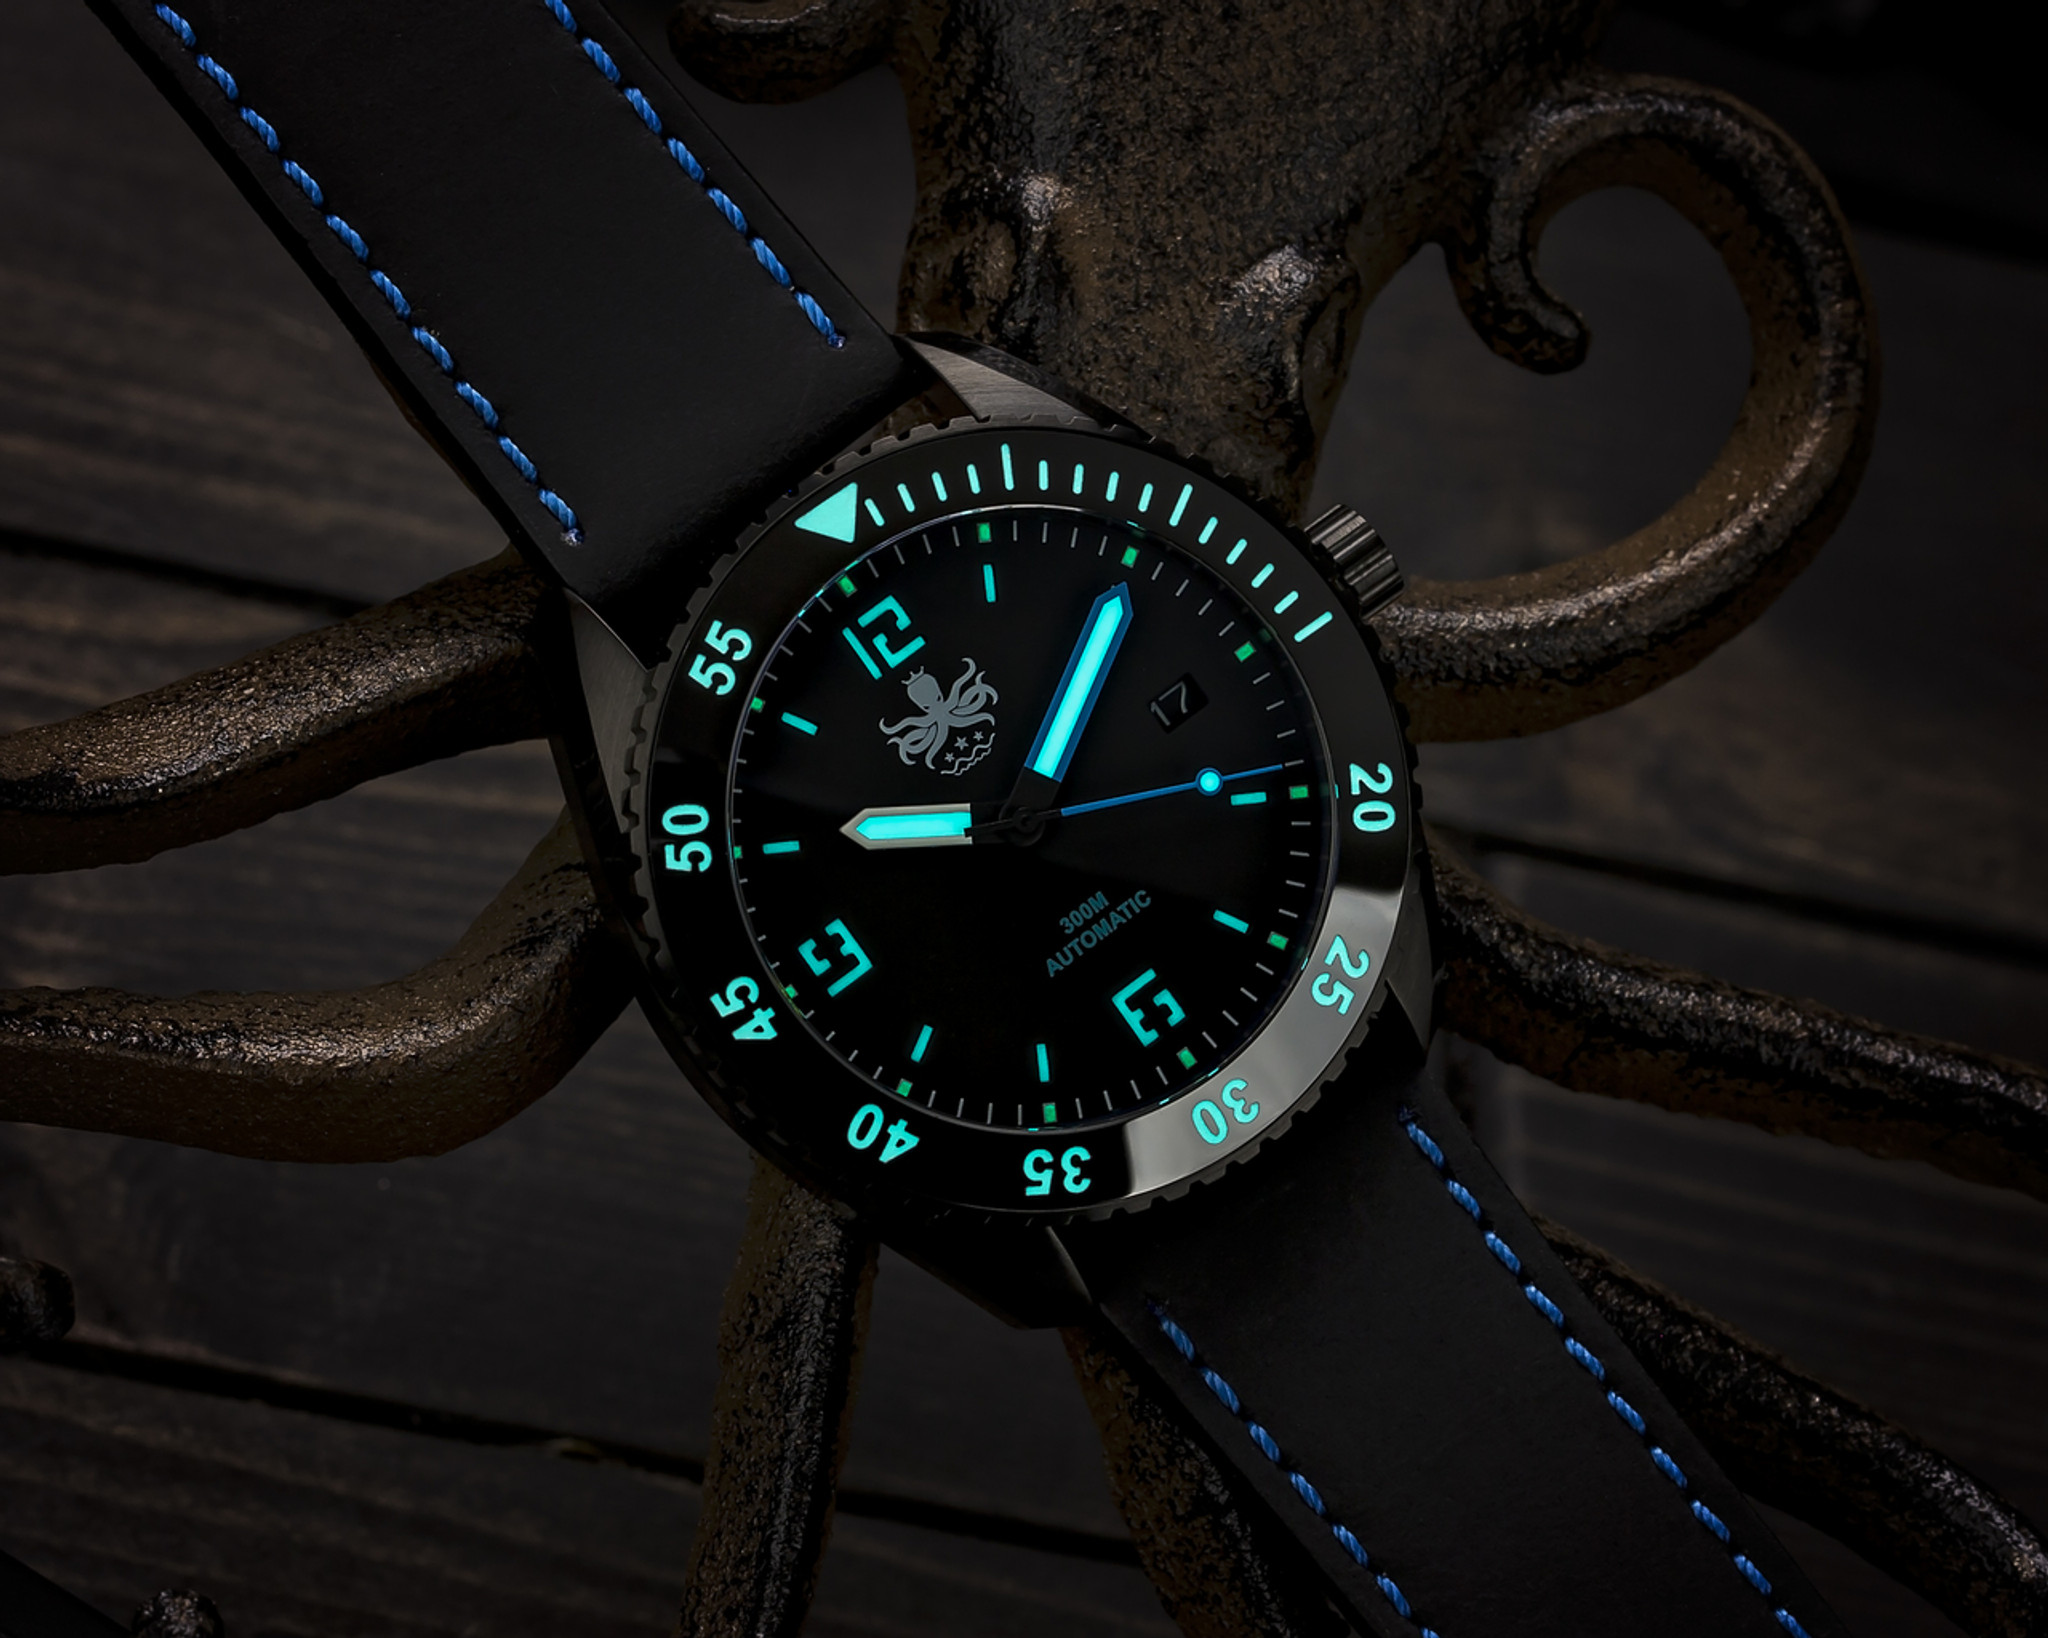 730fc17b86b PHOIBOS REEF MASTER PY015B DLC 300M Automatic Diver Watch Blue